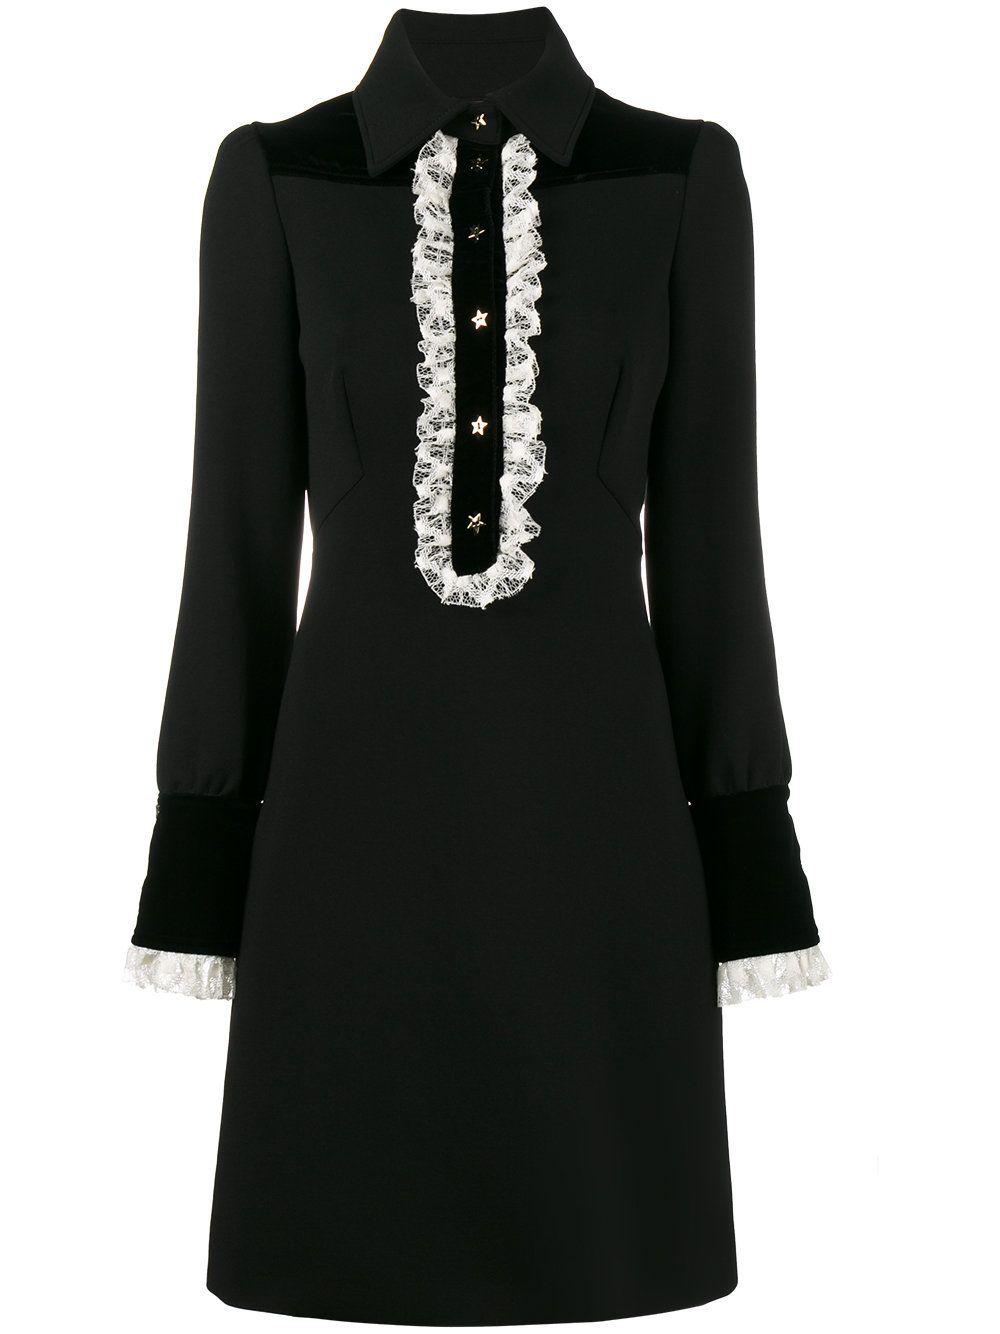 Philosophy Di Lorenzo Serafini Lace Trimmed Long Sleeve Dress Farfetch Short Lace Dress Fashion Dresses Long Sleeve Dress [ 1334 x 1000 Pixel ]